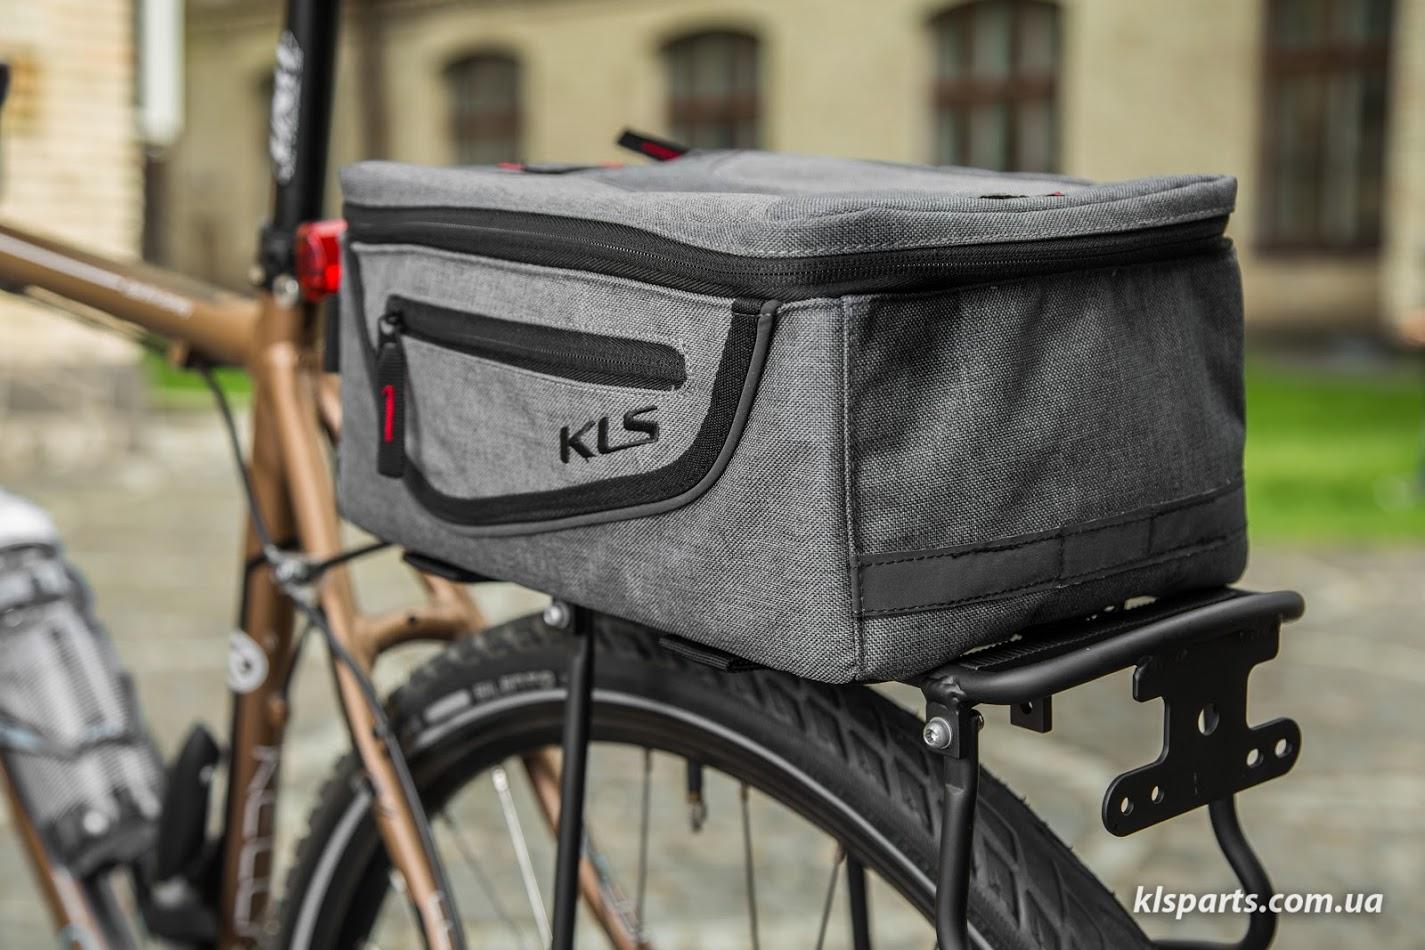 Сумка на багажник KLS Space City (об`єм 10 л) чорний